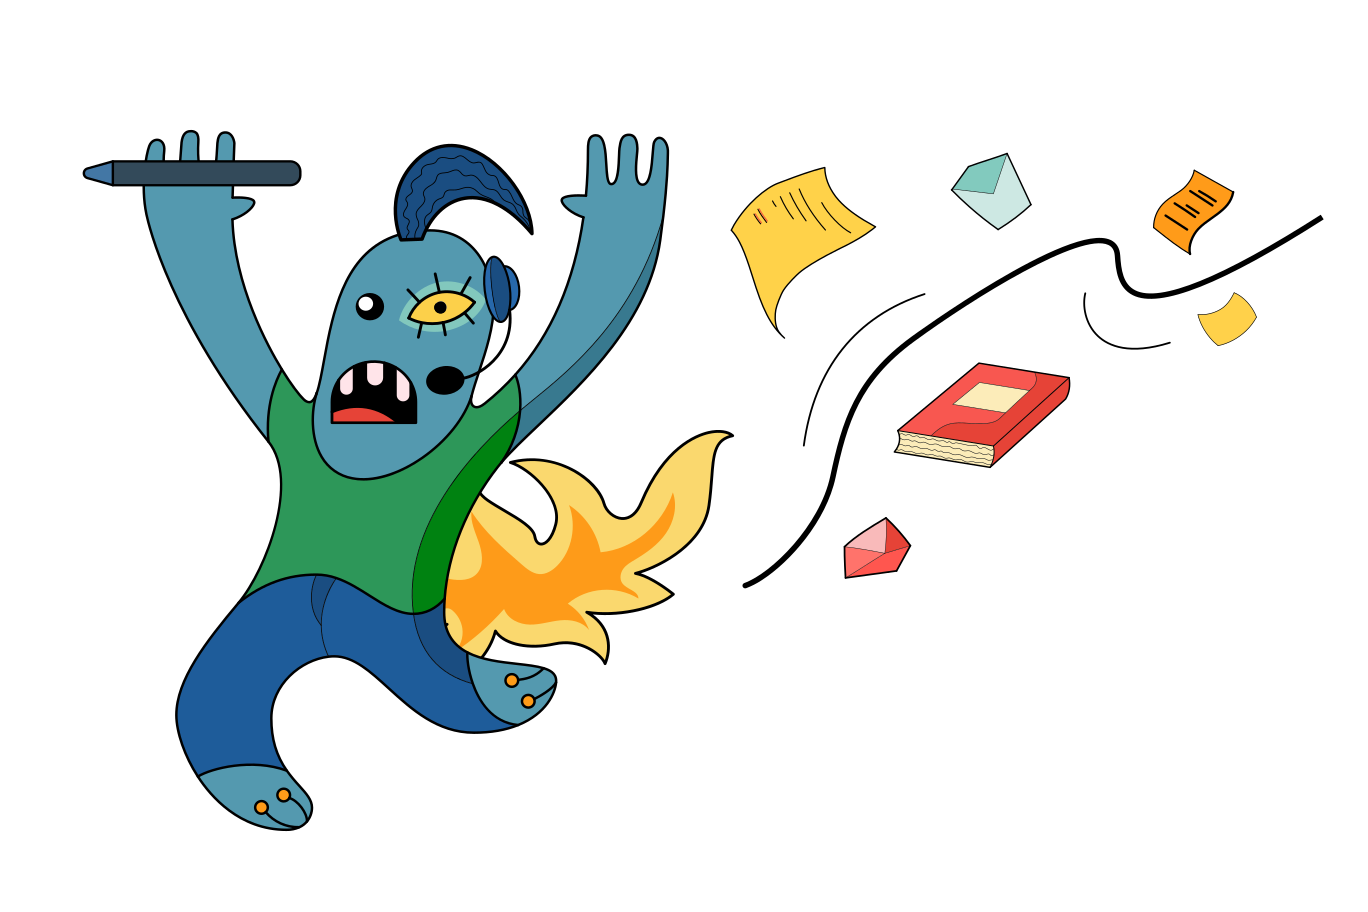 Avoiding work Clipart illustration in PNG, SVG